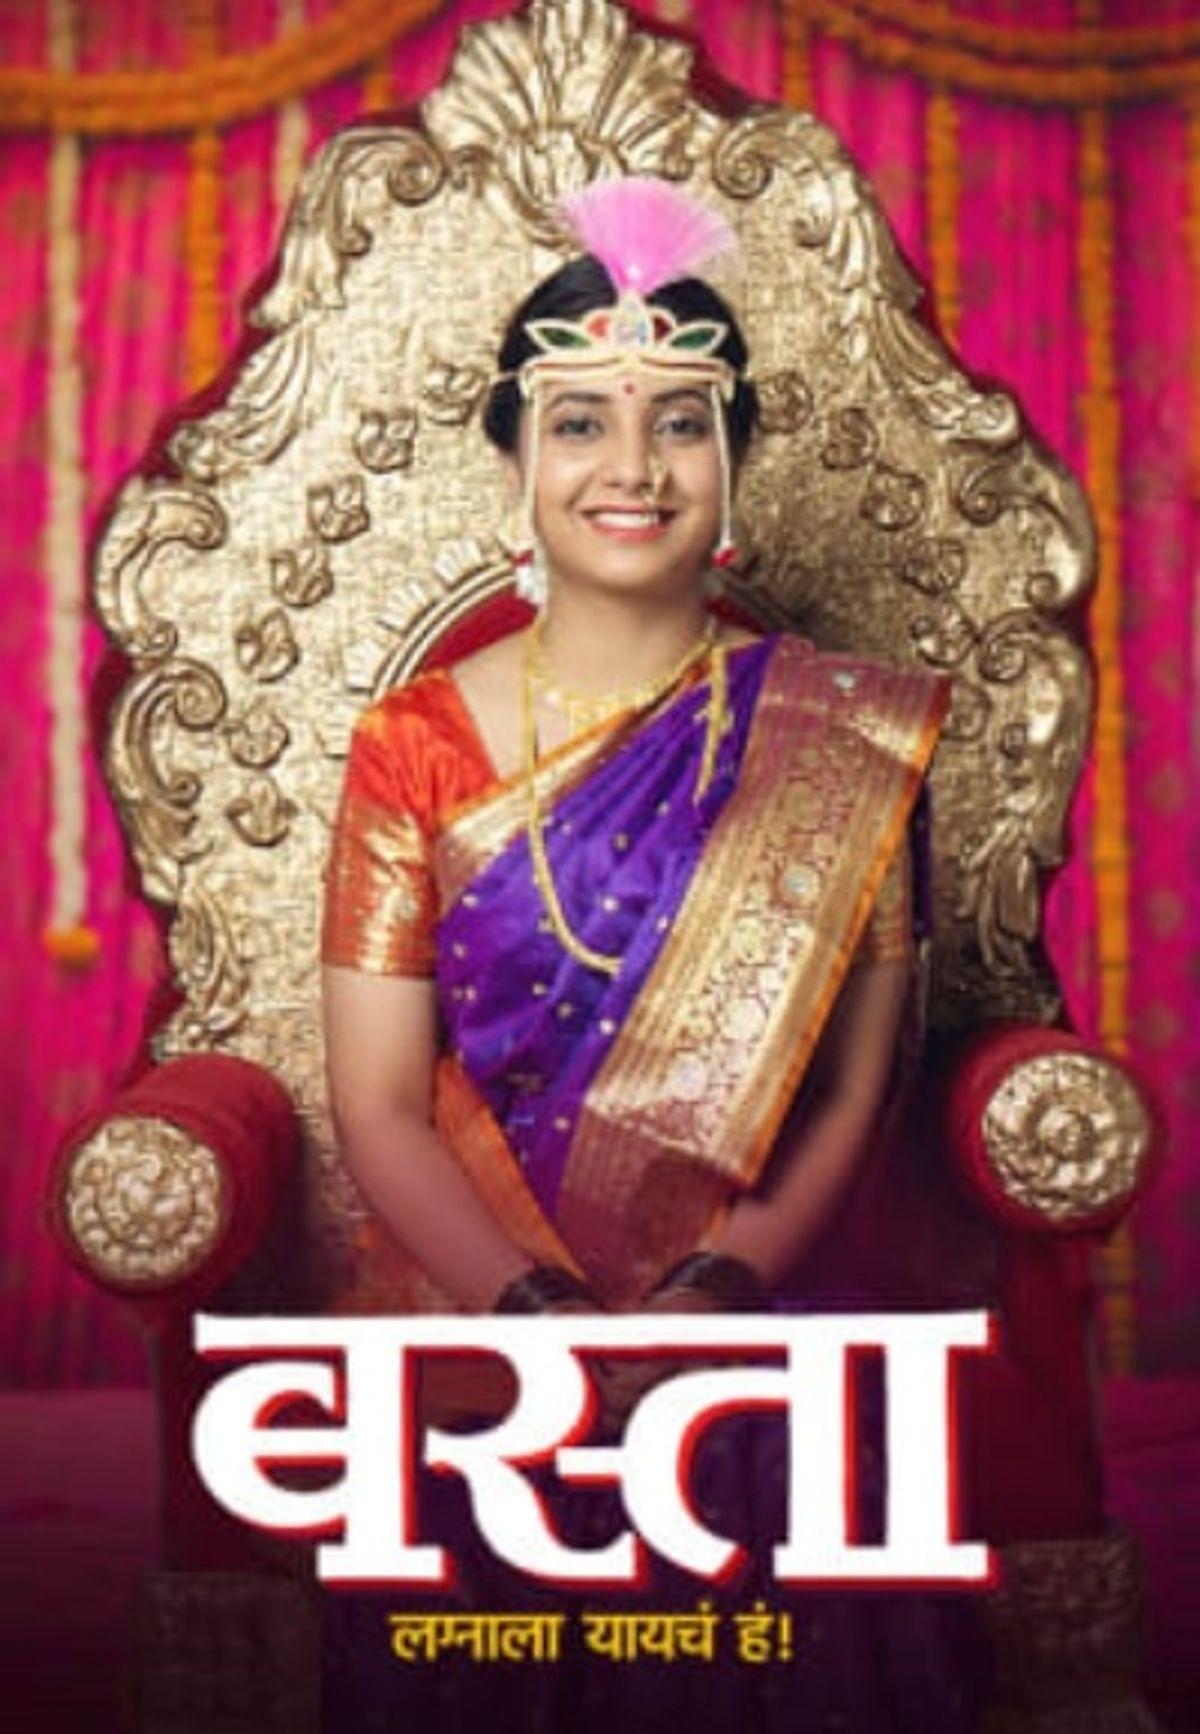 Suhas Palshikar Best Movies, TV Shows and Web Series List